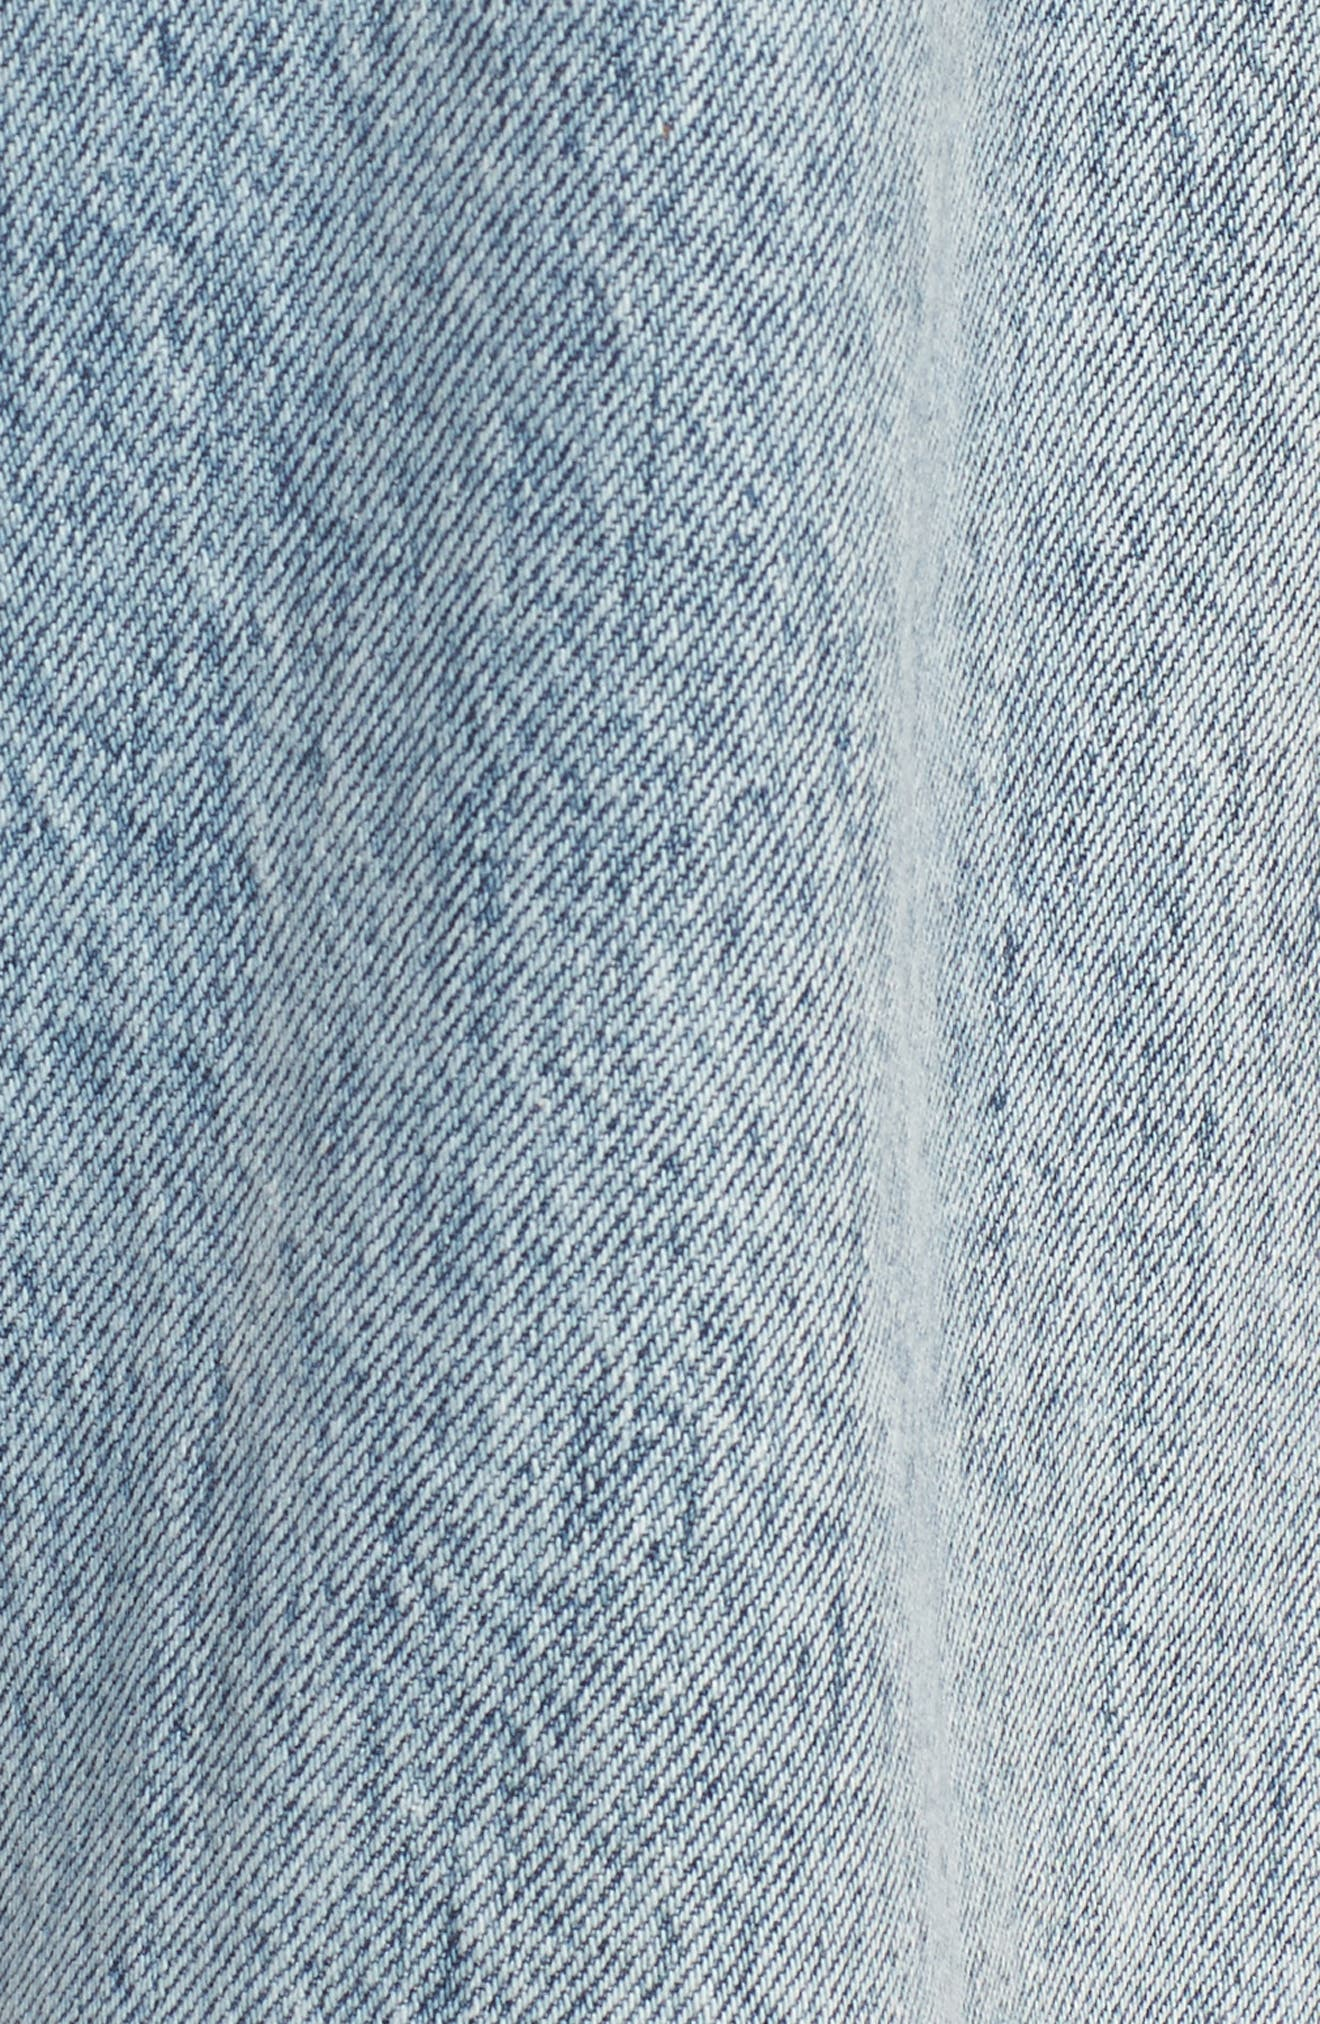 Rickie High Waist Boyfriend Jeans,                             Alternate thumbnail 6, color,                             Mineral Desert Springs 3